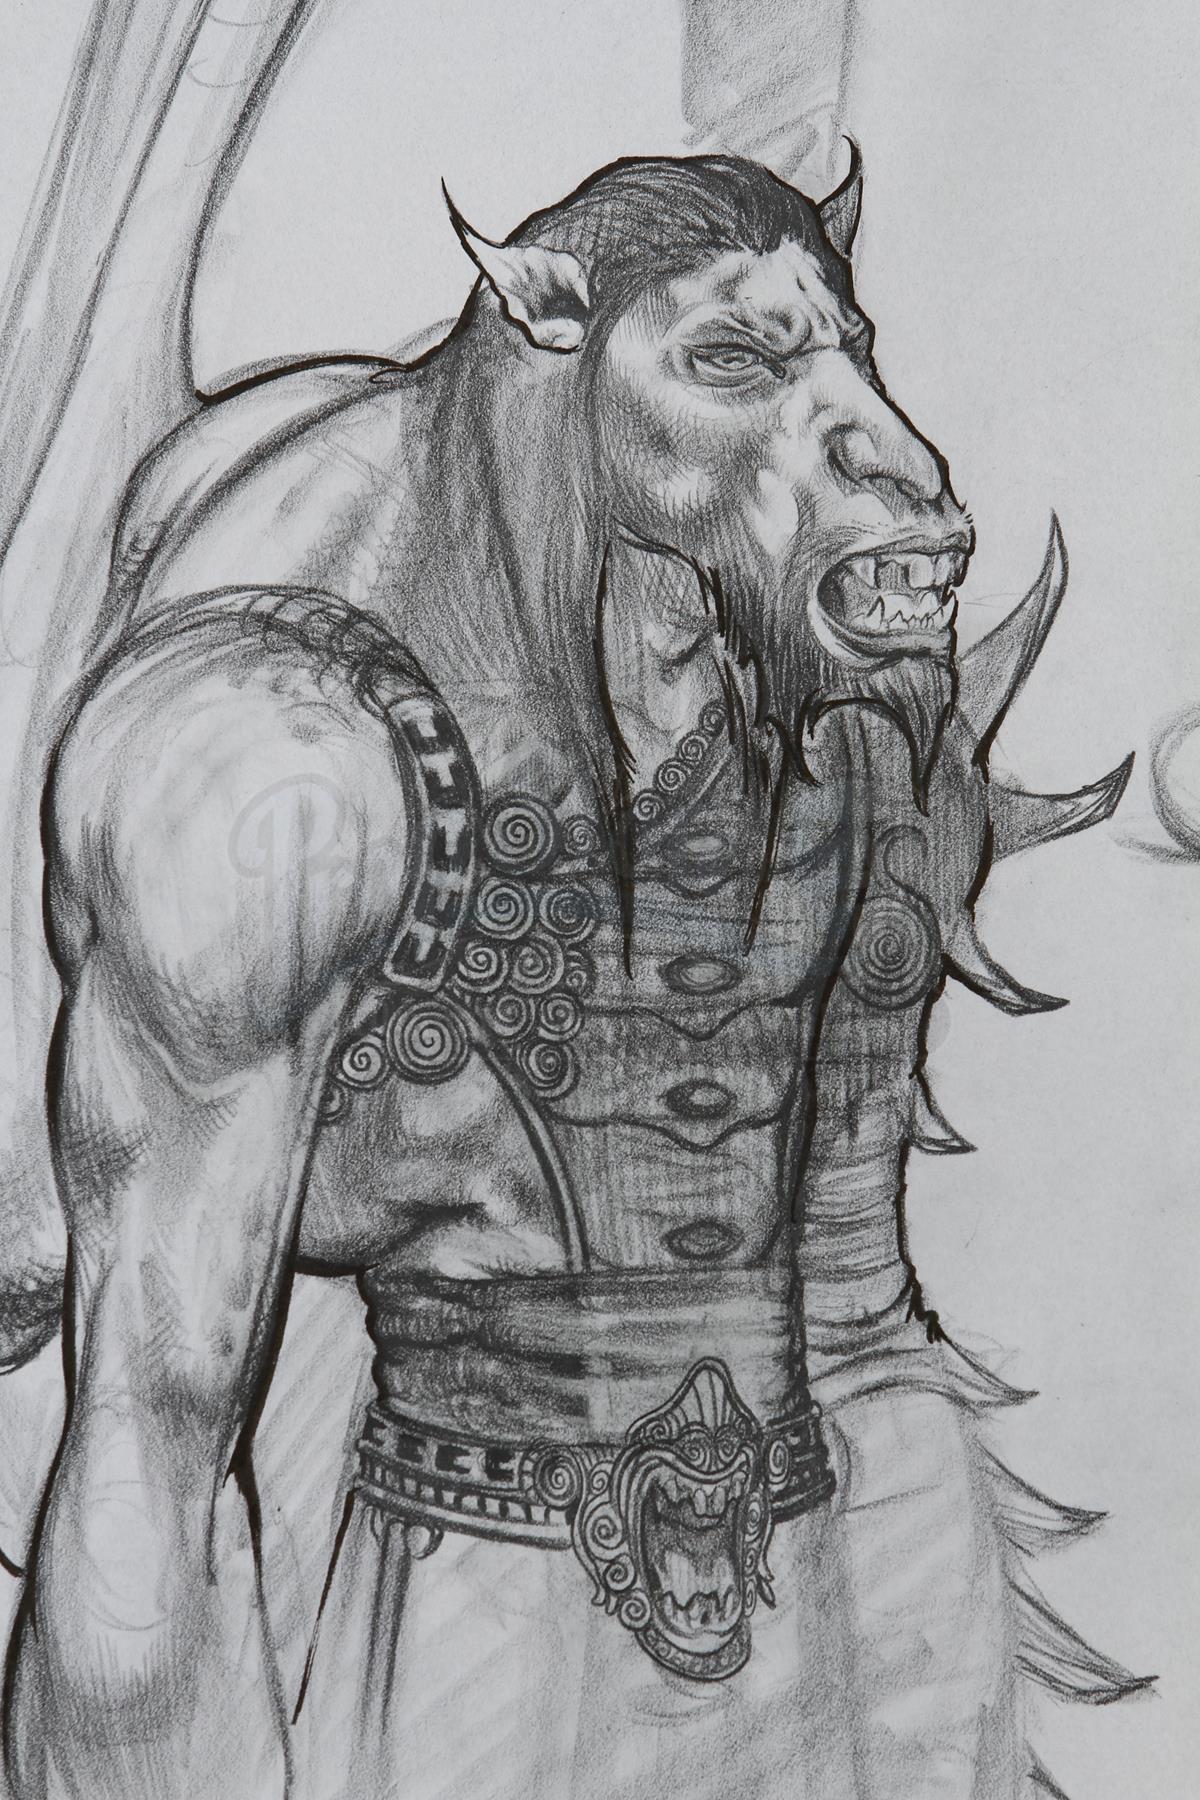 A horse-like version of Goliath the gargoyle